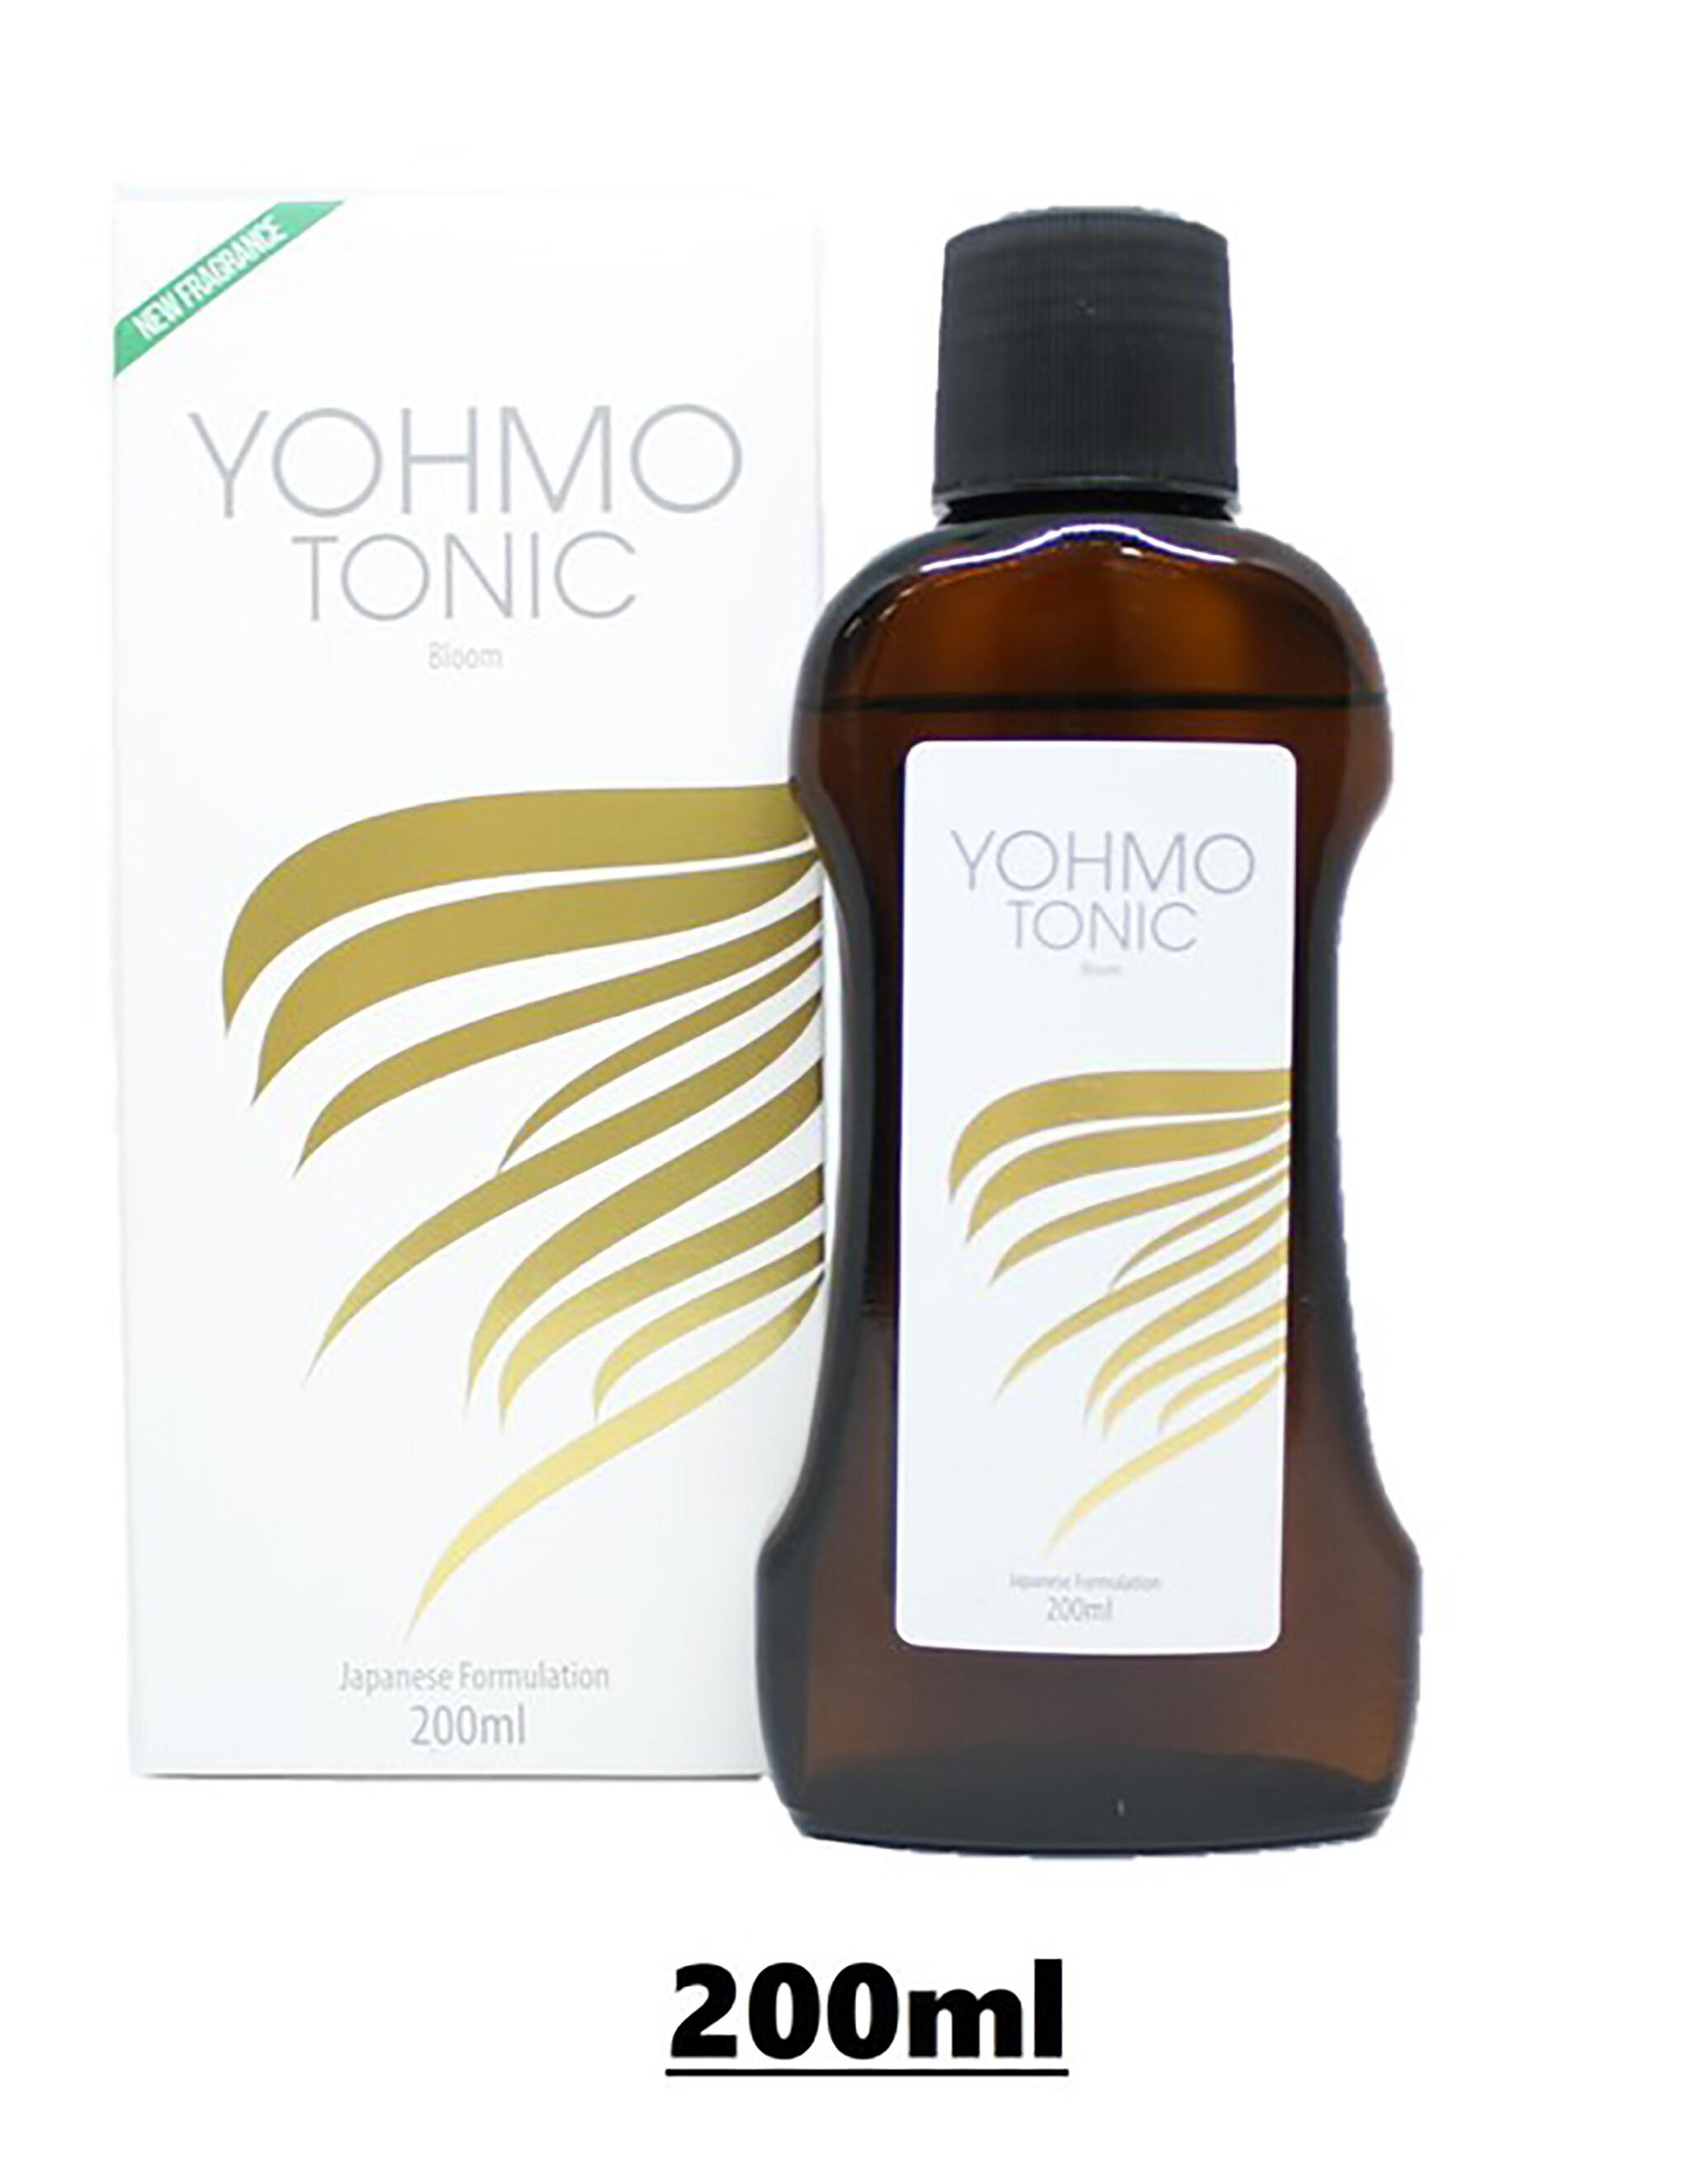 YOHMO TONIC BLOOM 200ML